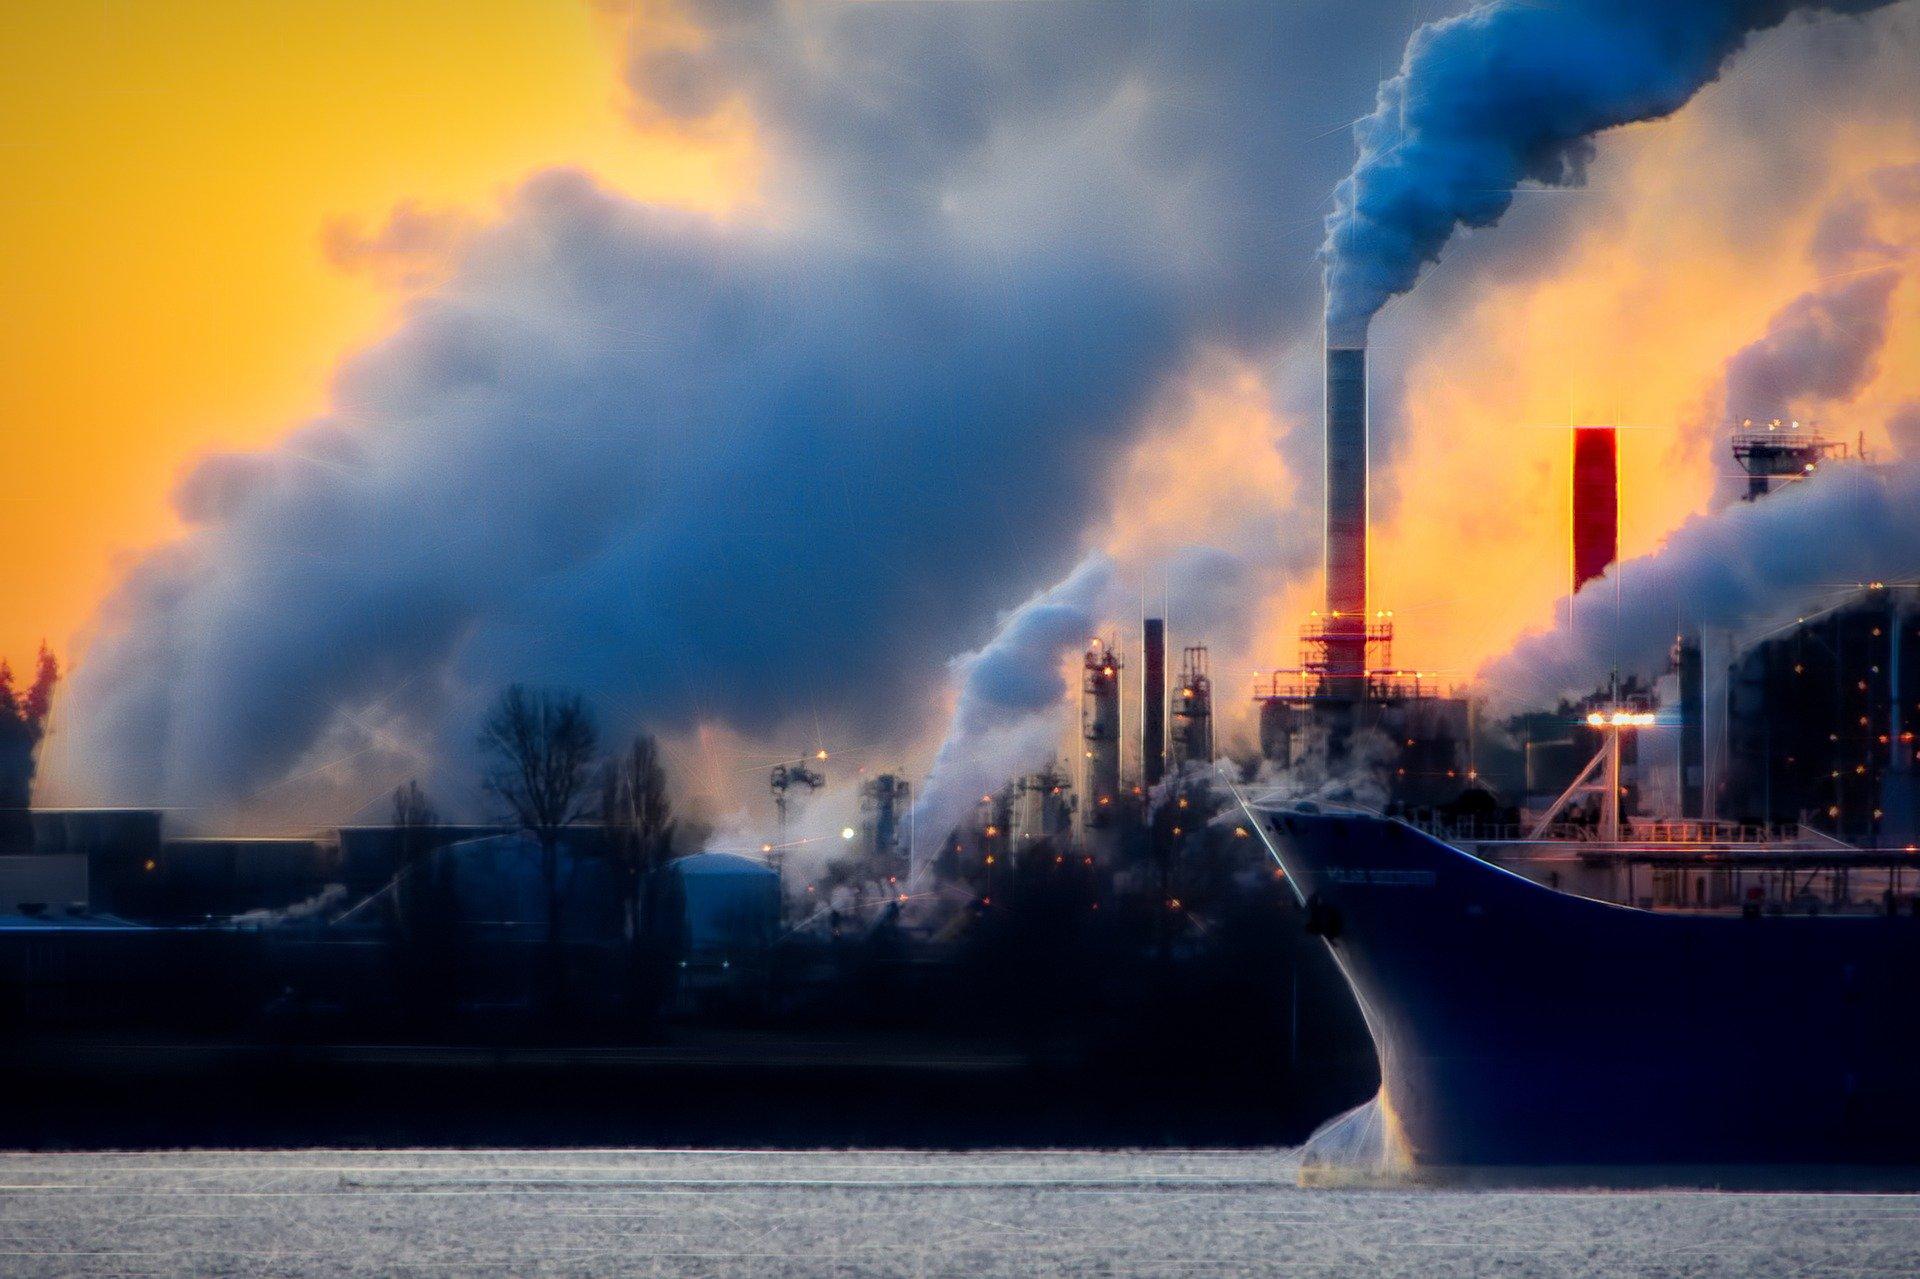 royaume-uni renonce financer energies fossiles etranger - L'Energeek